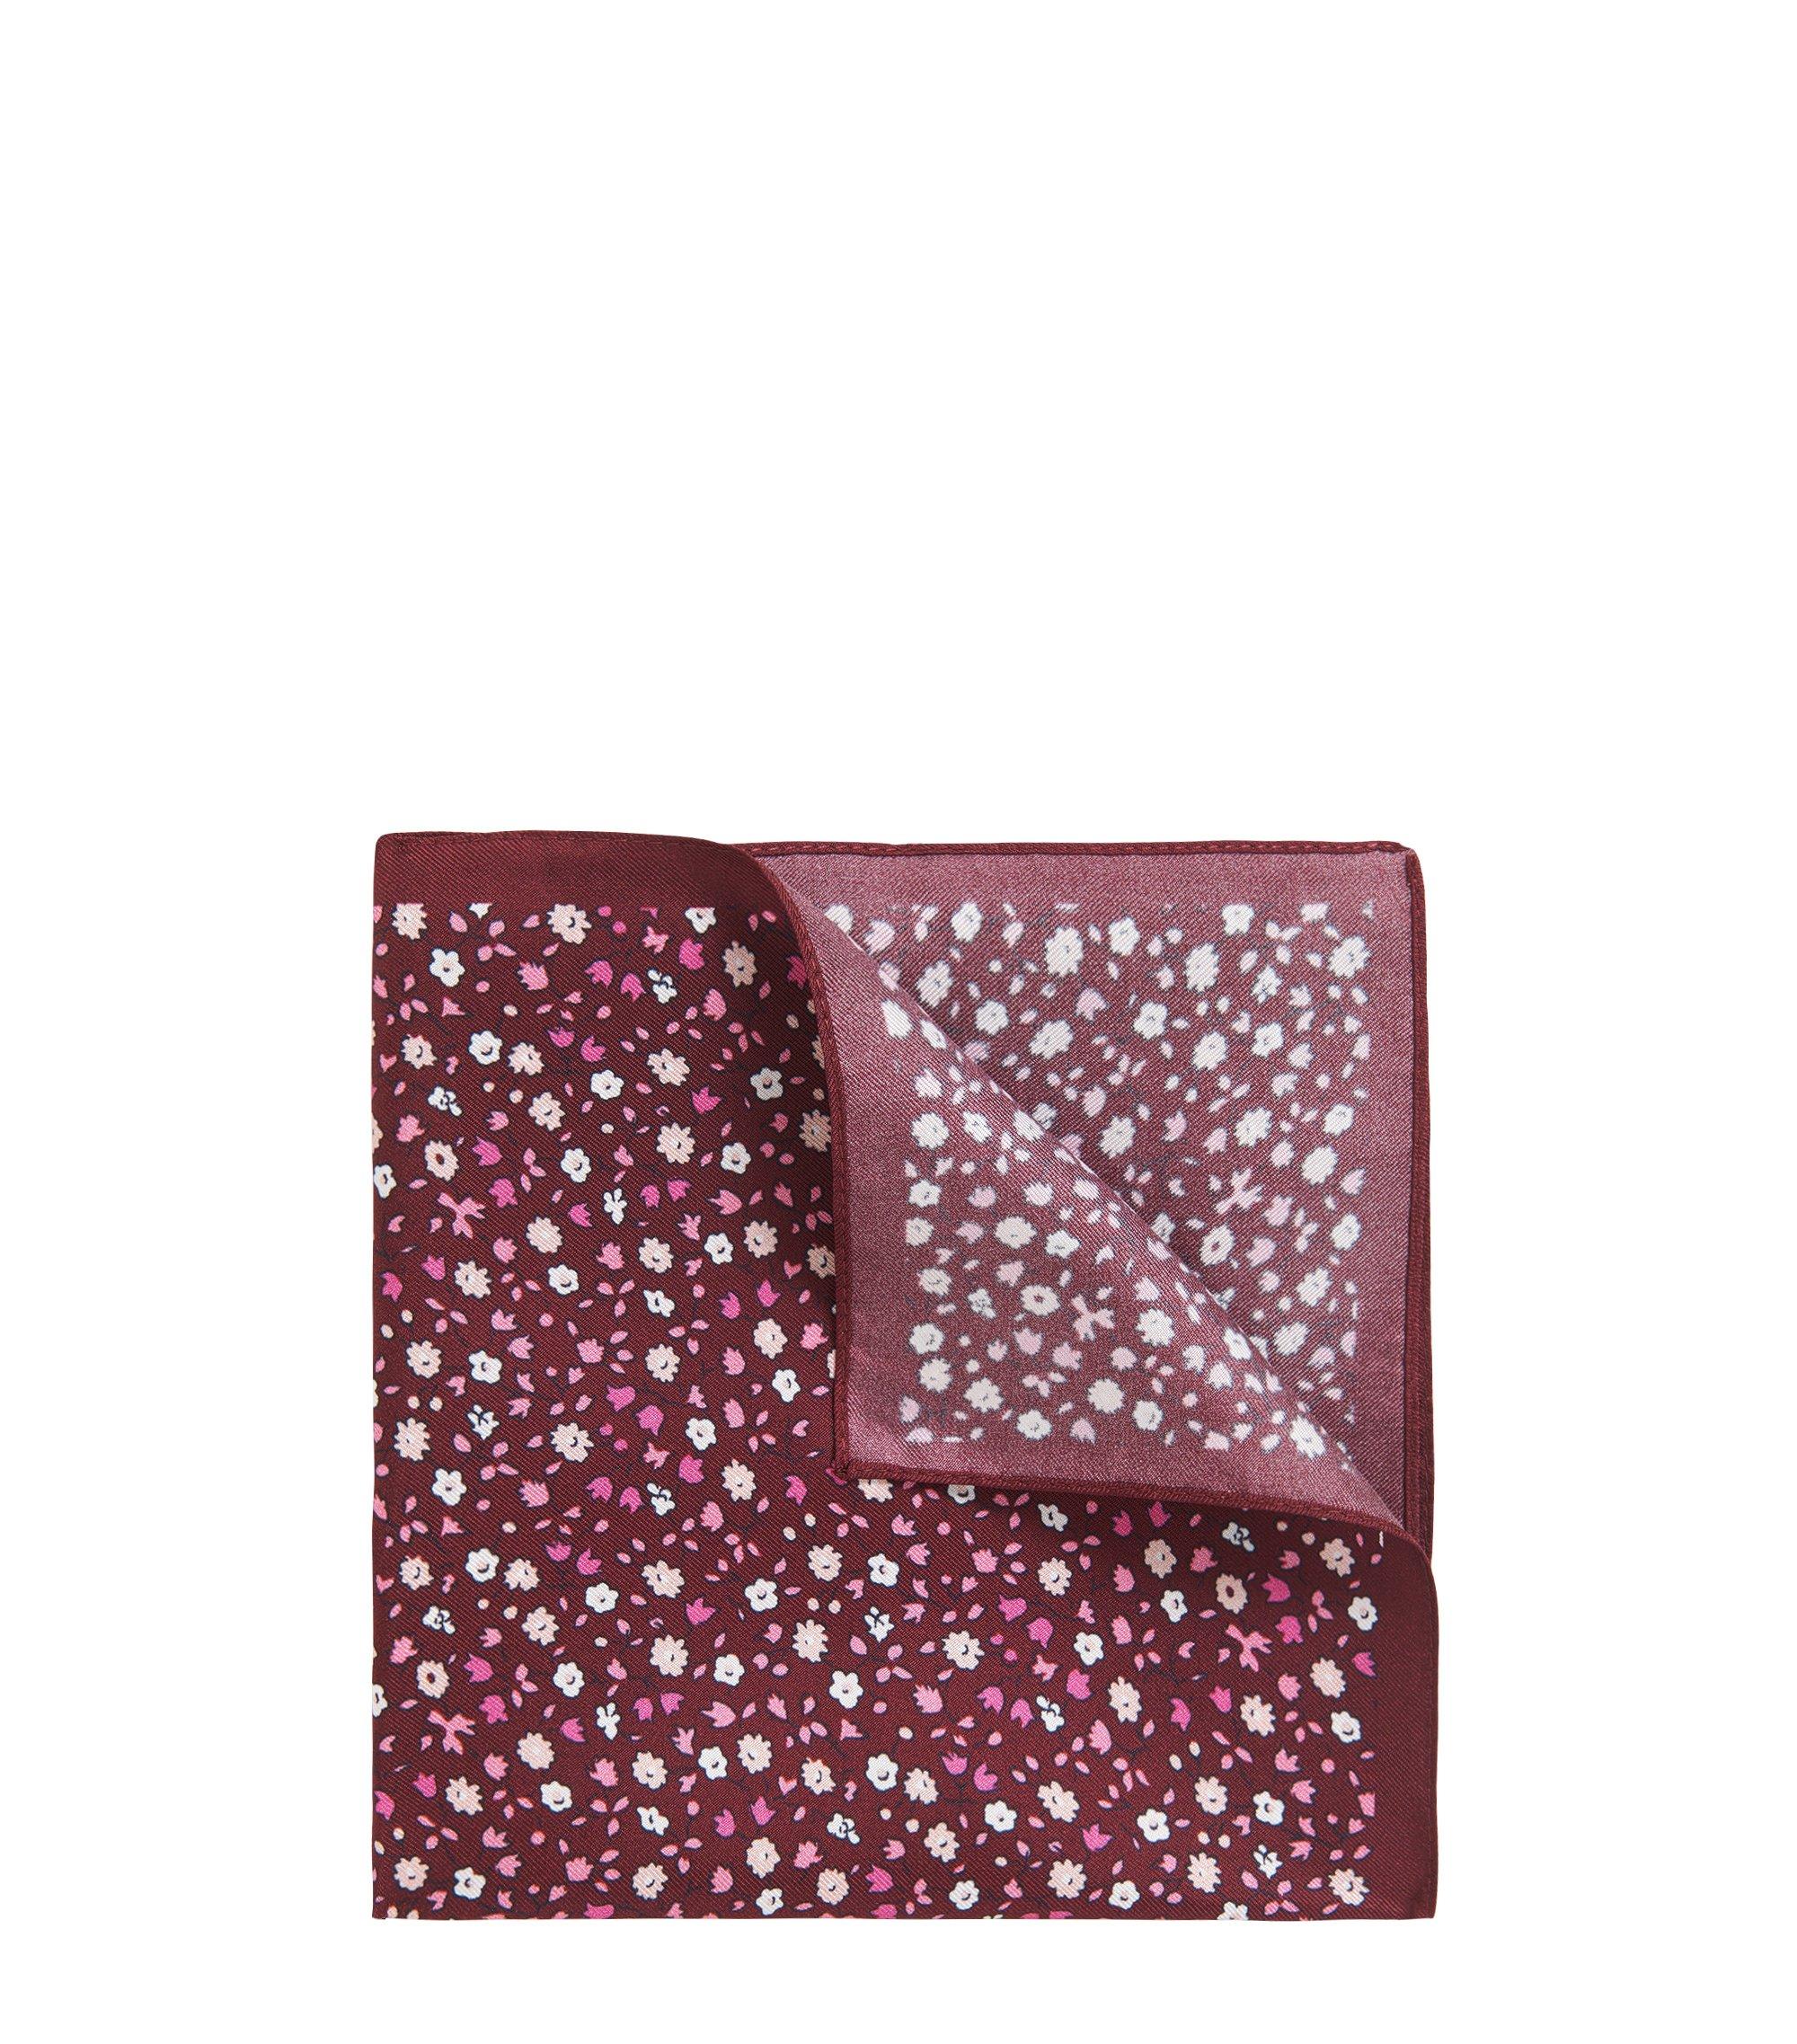 Pañuelo de bolsillo microestampado en sarga de seda, Rojo